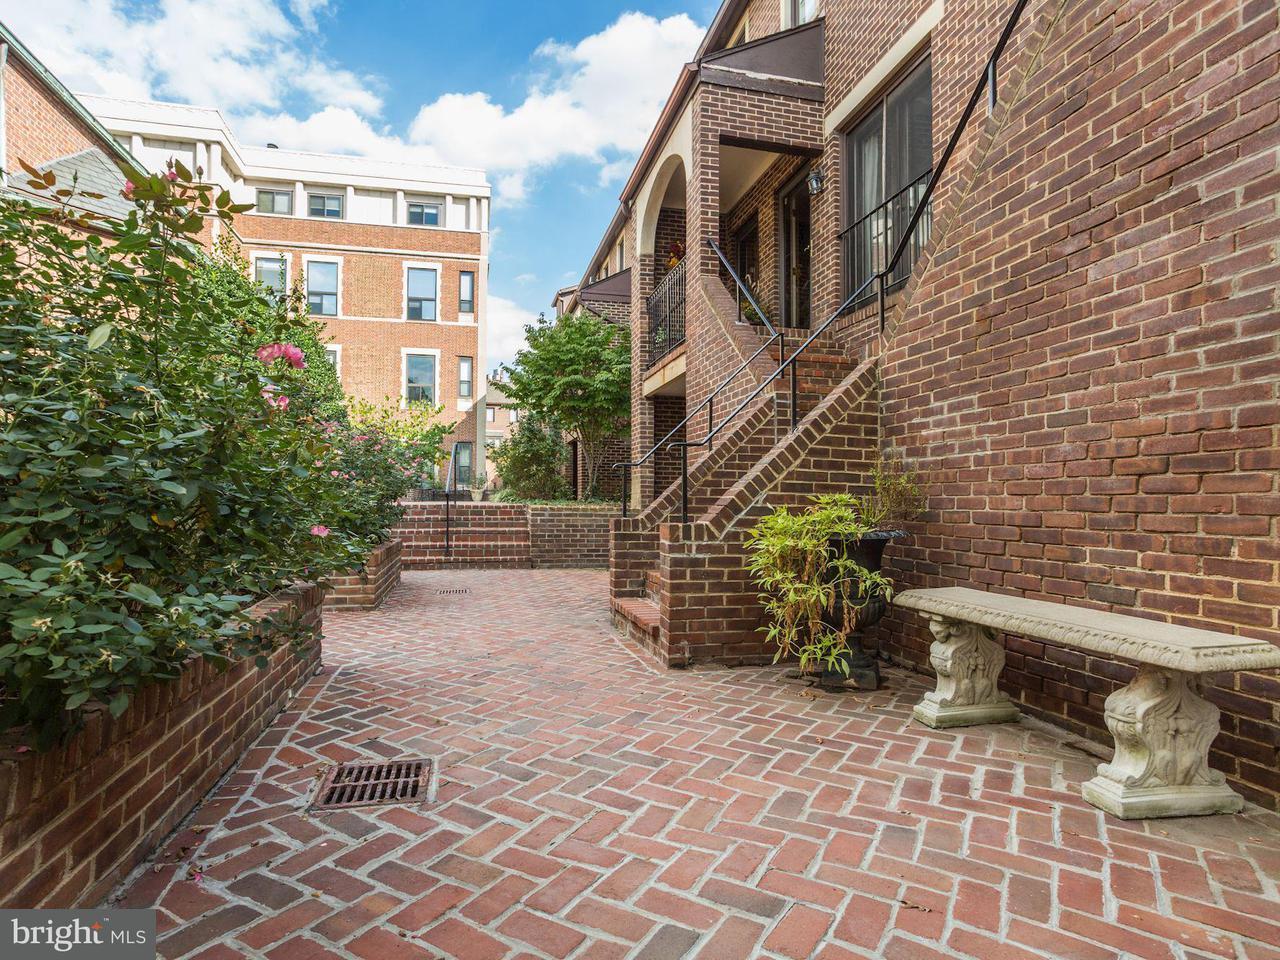 Additional photo for property listing at 1715 15th St Nw #103 1715 15th St Nw #103 Washington, Distrito De Columbia 20009 Estados Unidos